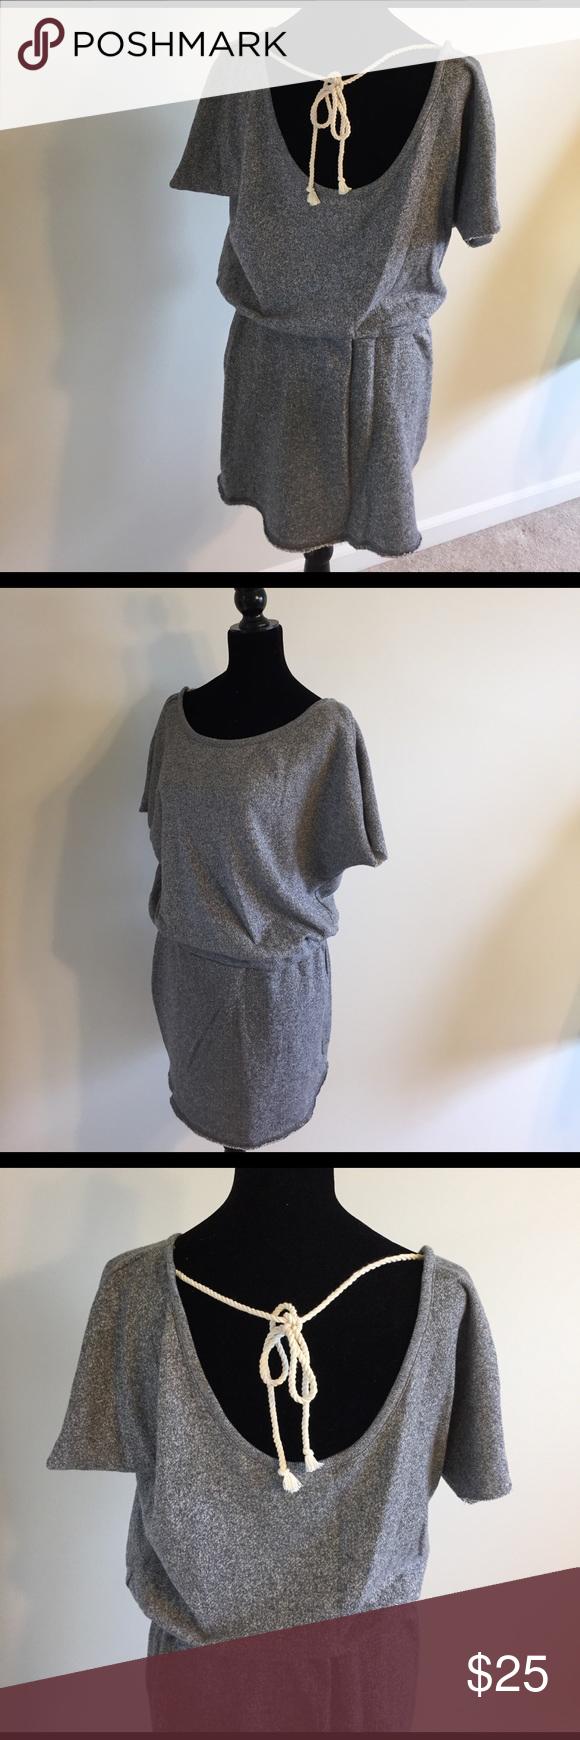 Victoria's Secret Jersey Sweatshirt Dress Cozy short sleeve jersey sweatshirt gray dress from Victoria's Secret. Great for the beach or a casual day out! Excellent condition! Victoria's Secret Dresses